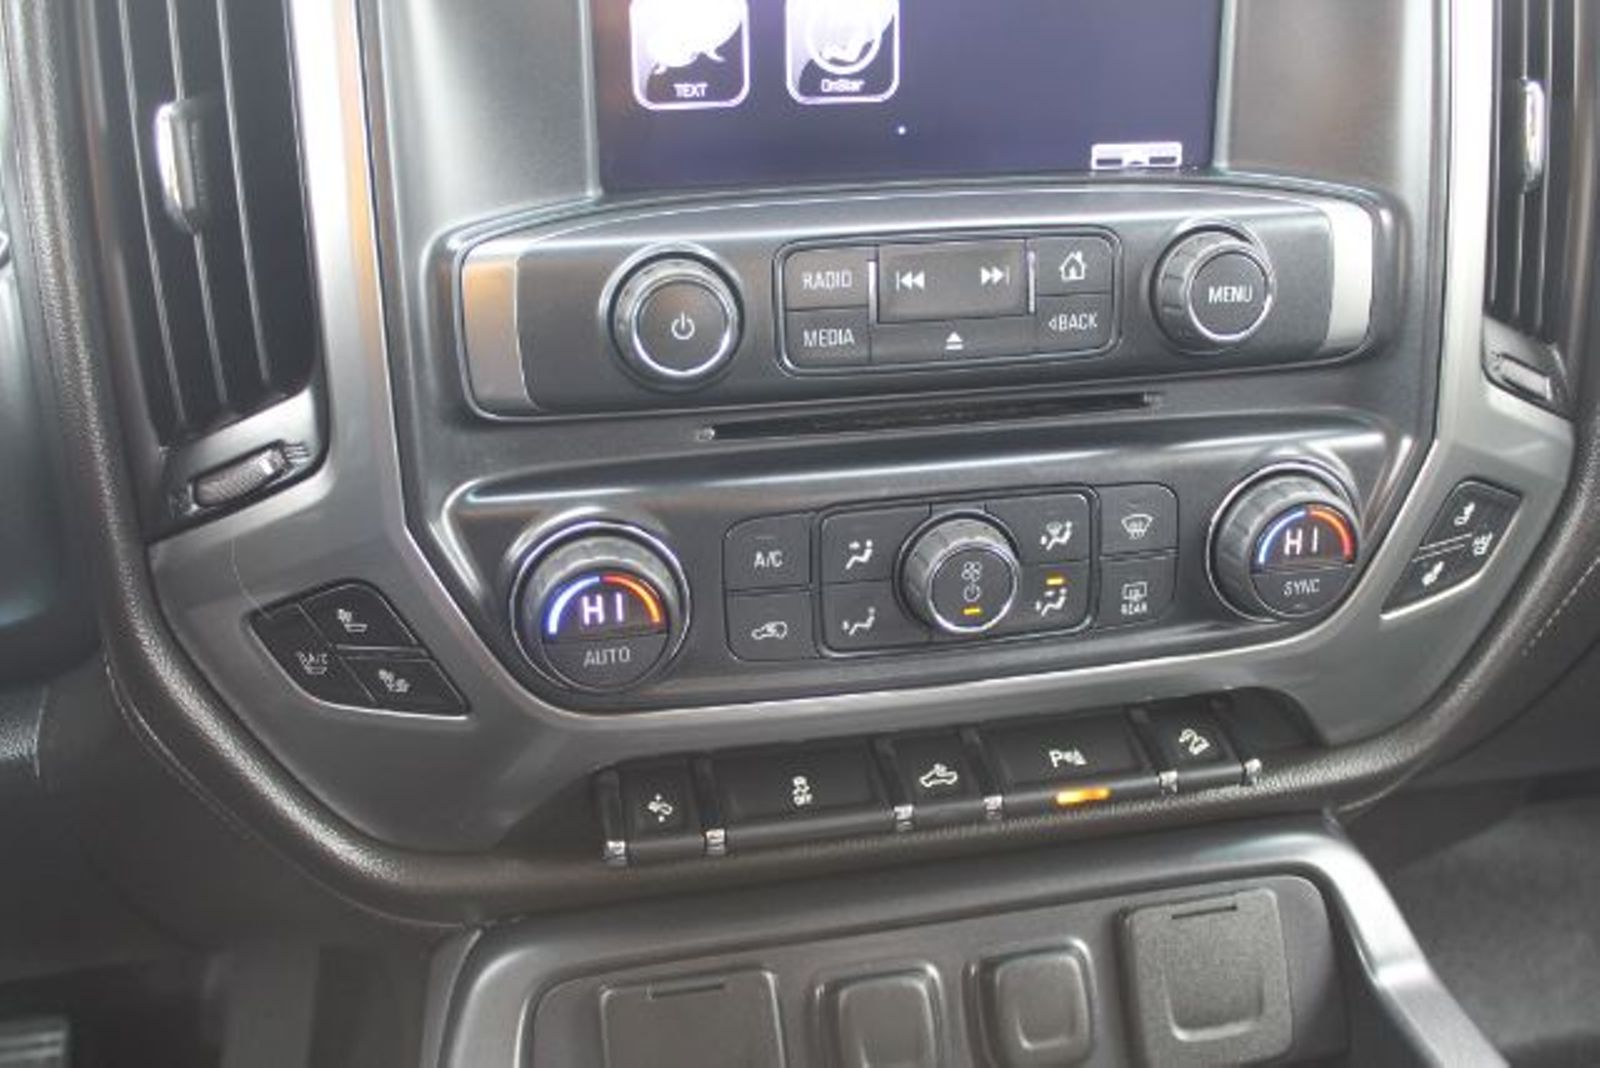 2015 Chevrolet Silverado 2500hd Ltz City Mt Bleskin Motor Company Trailer Wiring Harness 2016 Jeep Grand Cherokee In Great Falls